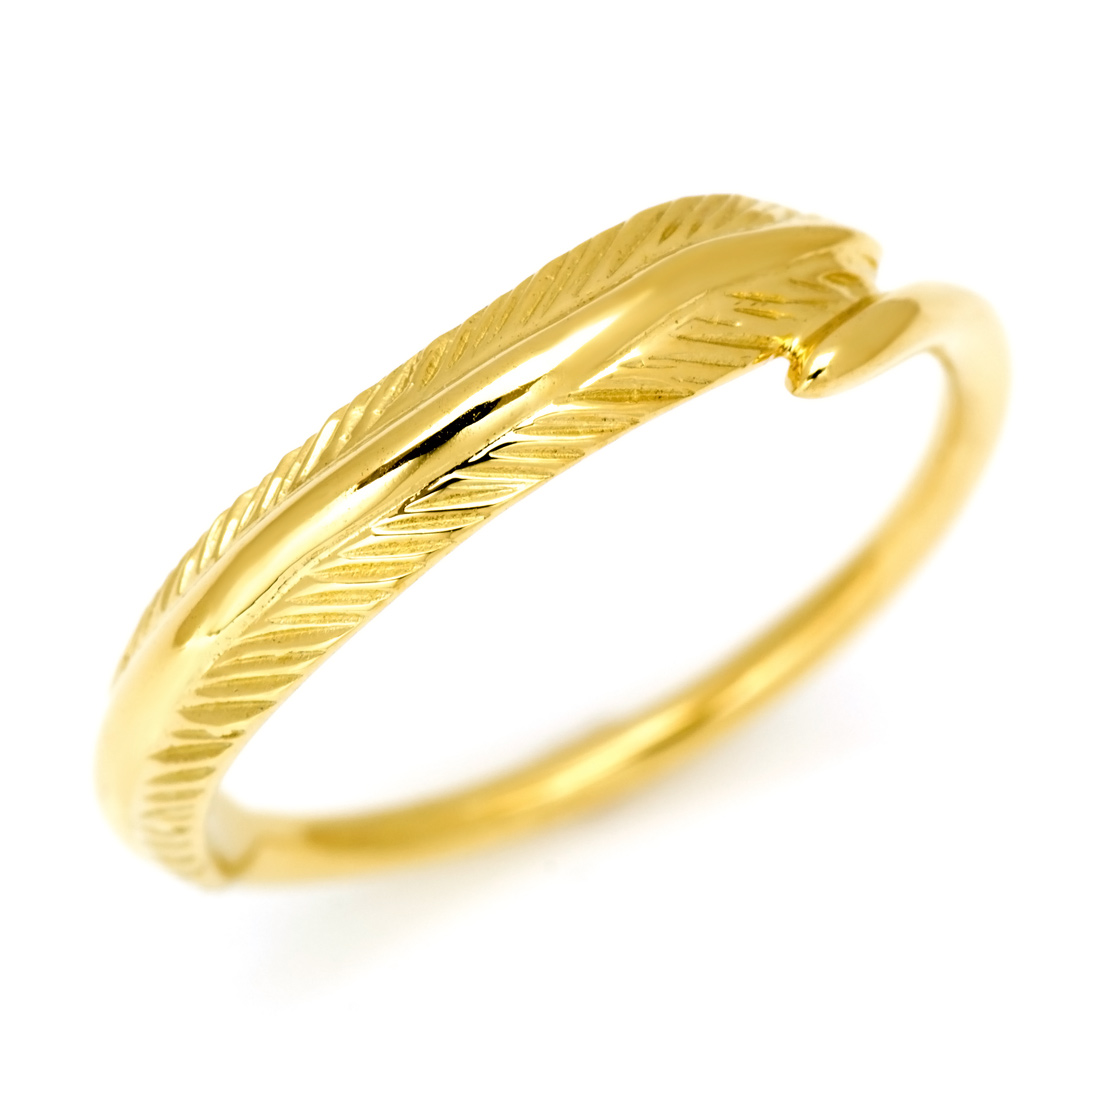 K18 メタルモチーフ リング 「feather」 指輪 リング フェザー 羽根 K18 18金 ゴールド 刻印 文字入れ メッセージ ギフト 贈り物 ピンキーリング対応可能